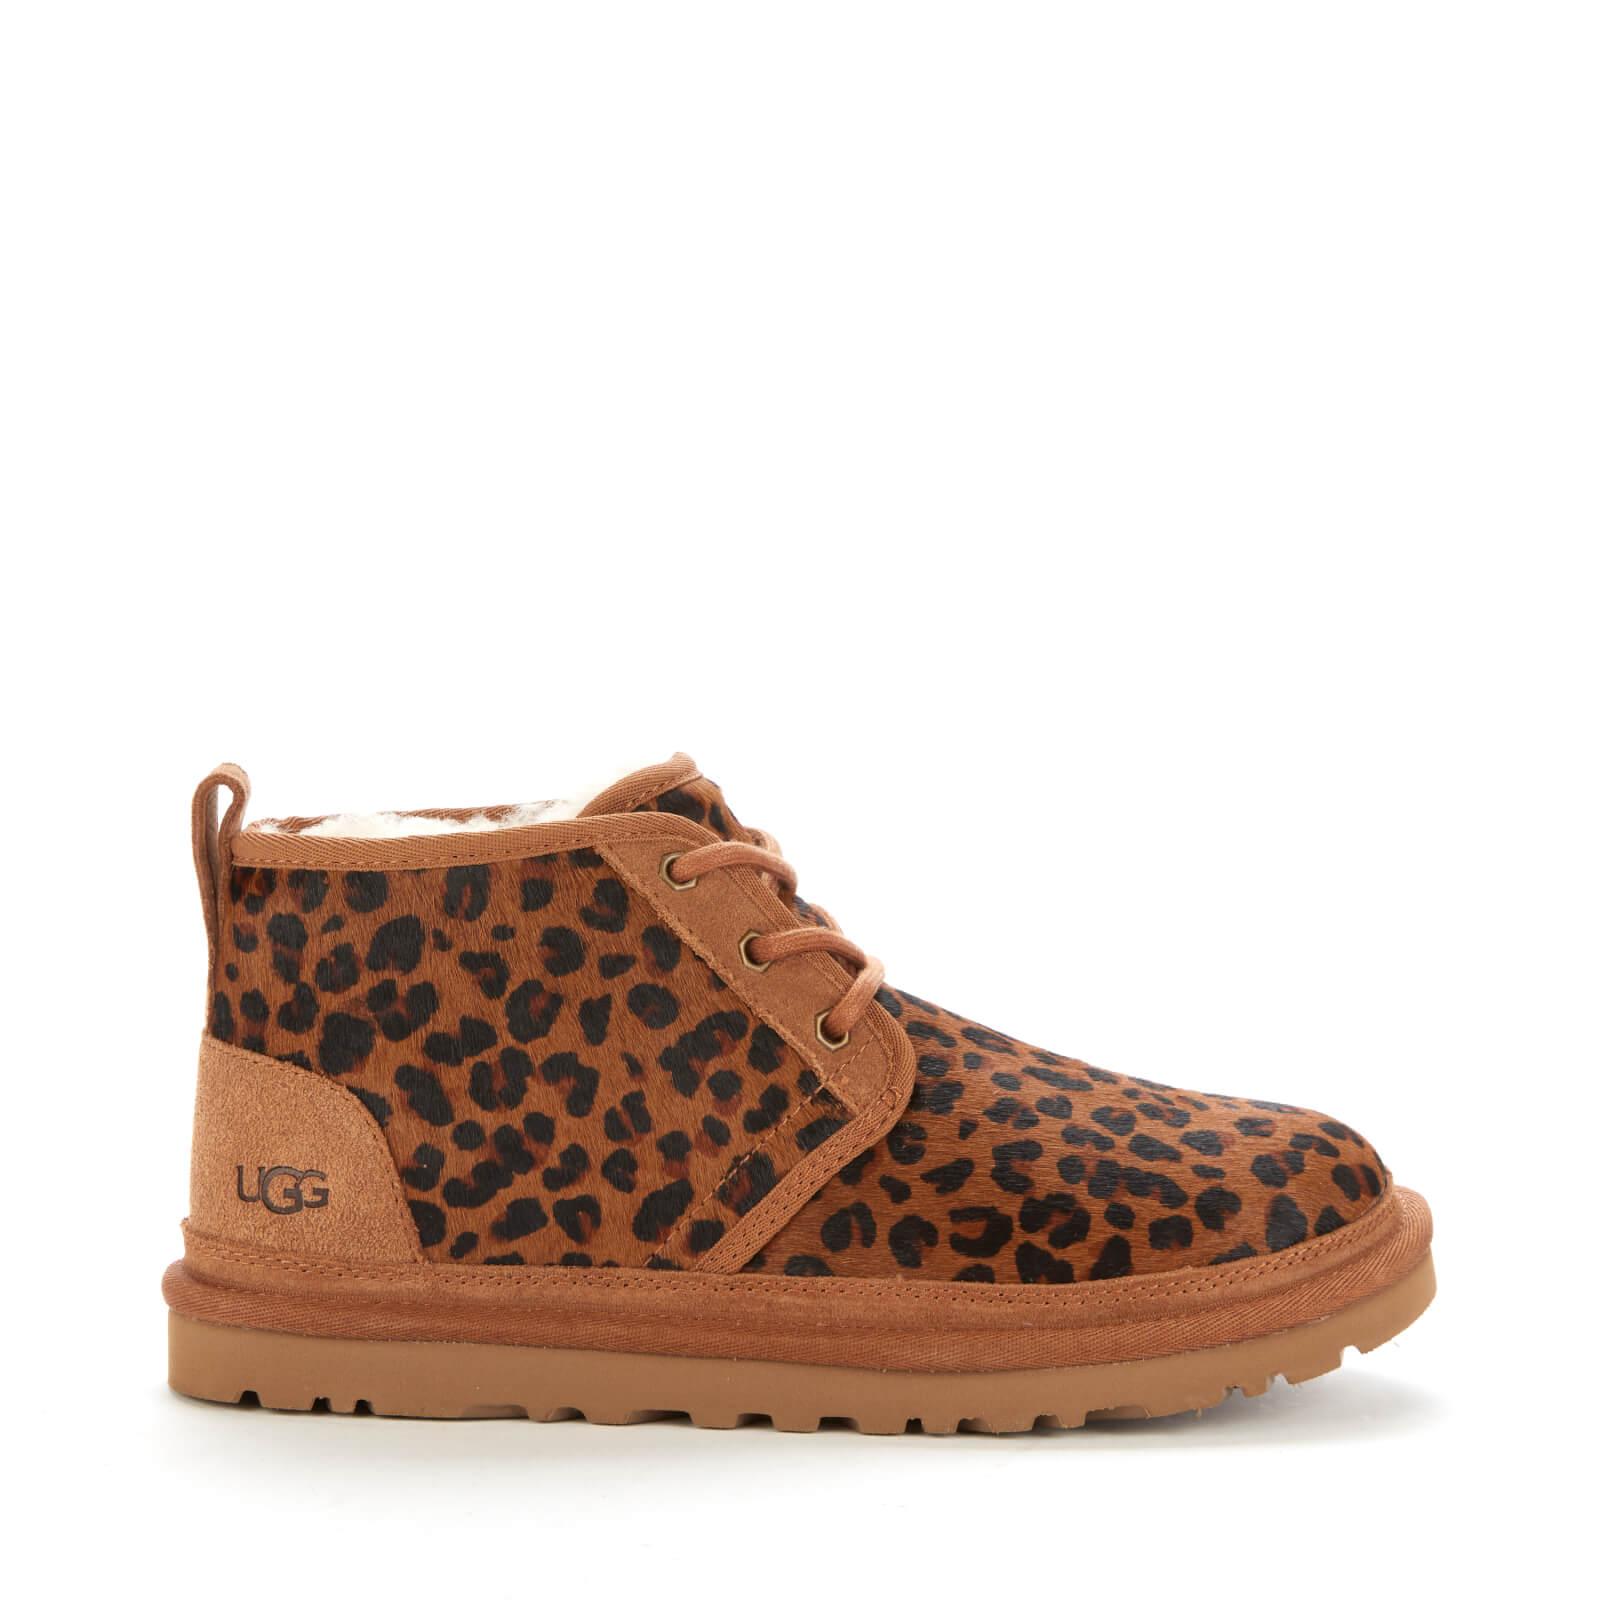 Ugg Women's Neumel Leopard Boots - Natural - Uk 3